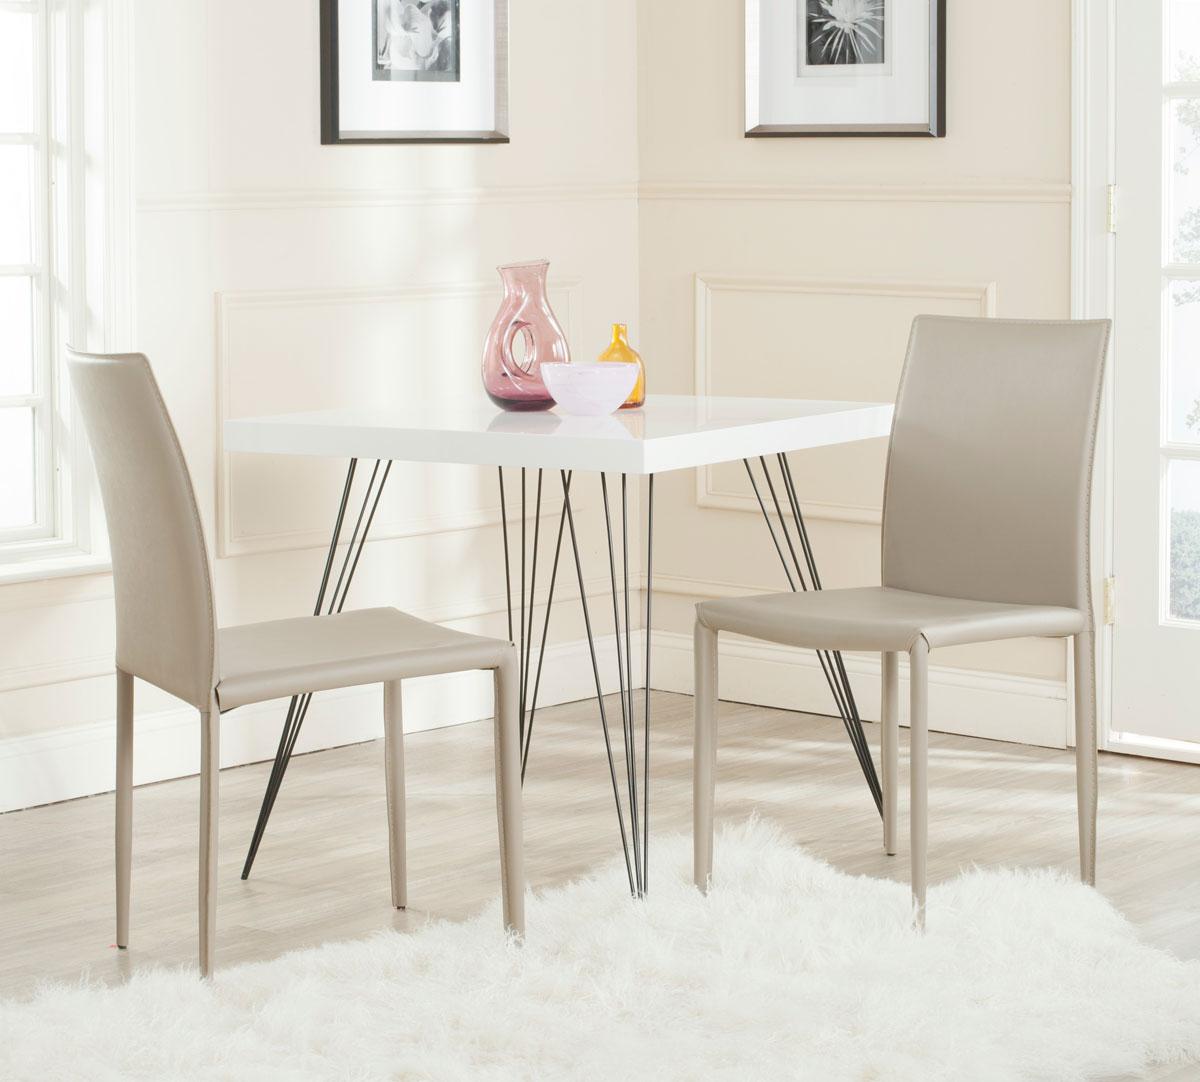 safavieh karna dining chair star wars kids fox2009m set2 chairs furniture by